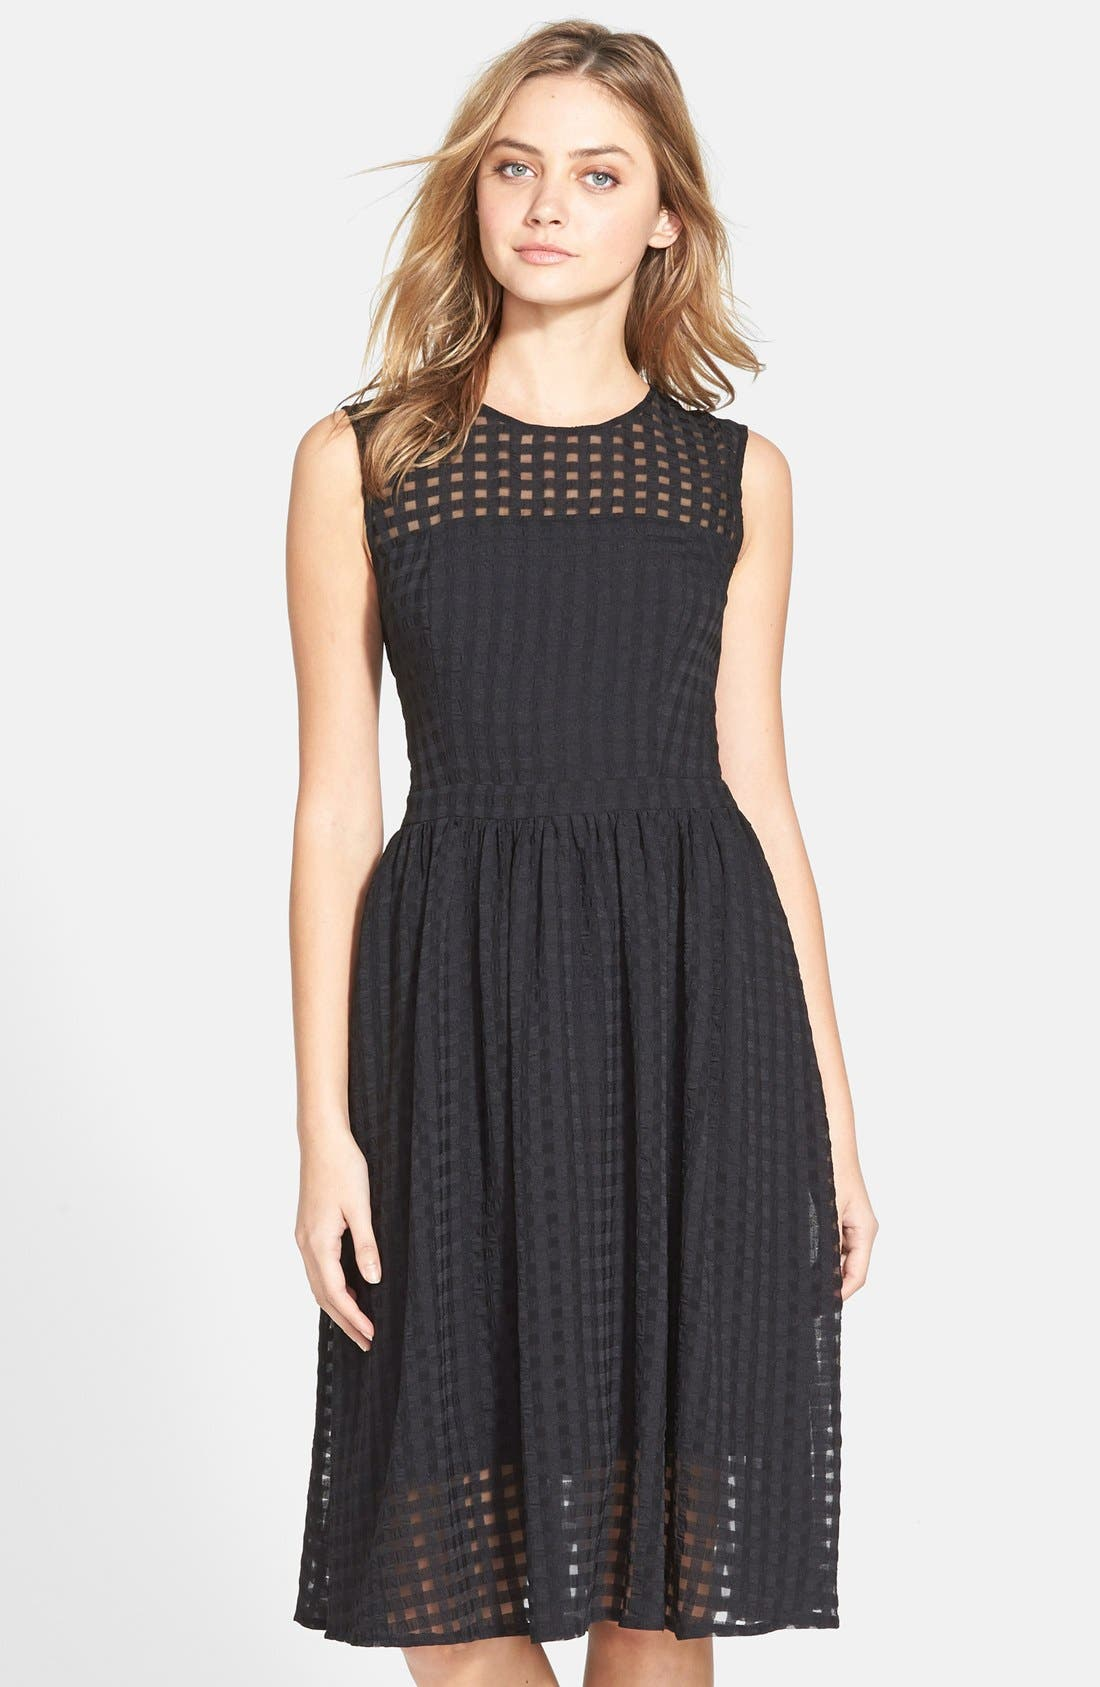 Alternate Image 1 Selected - Donna Morgan Chiffon Fit & Flare Dress